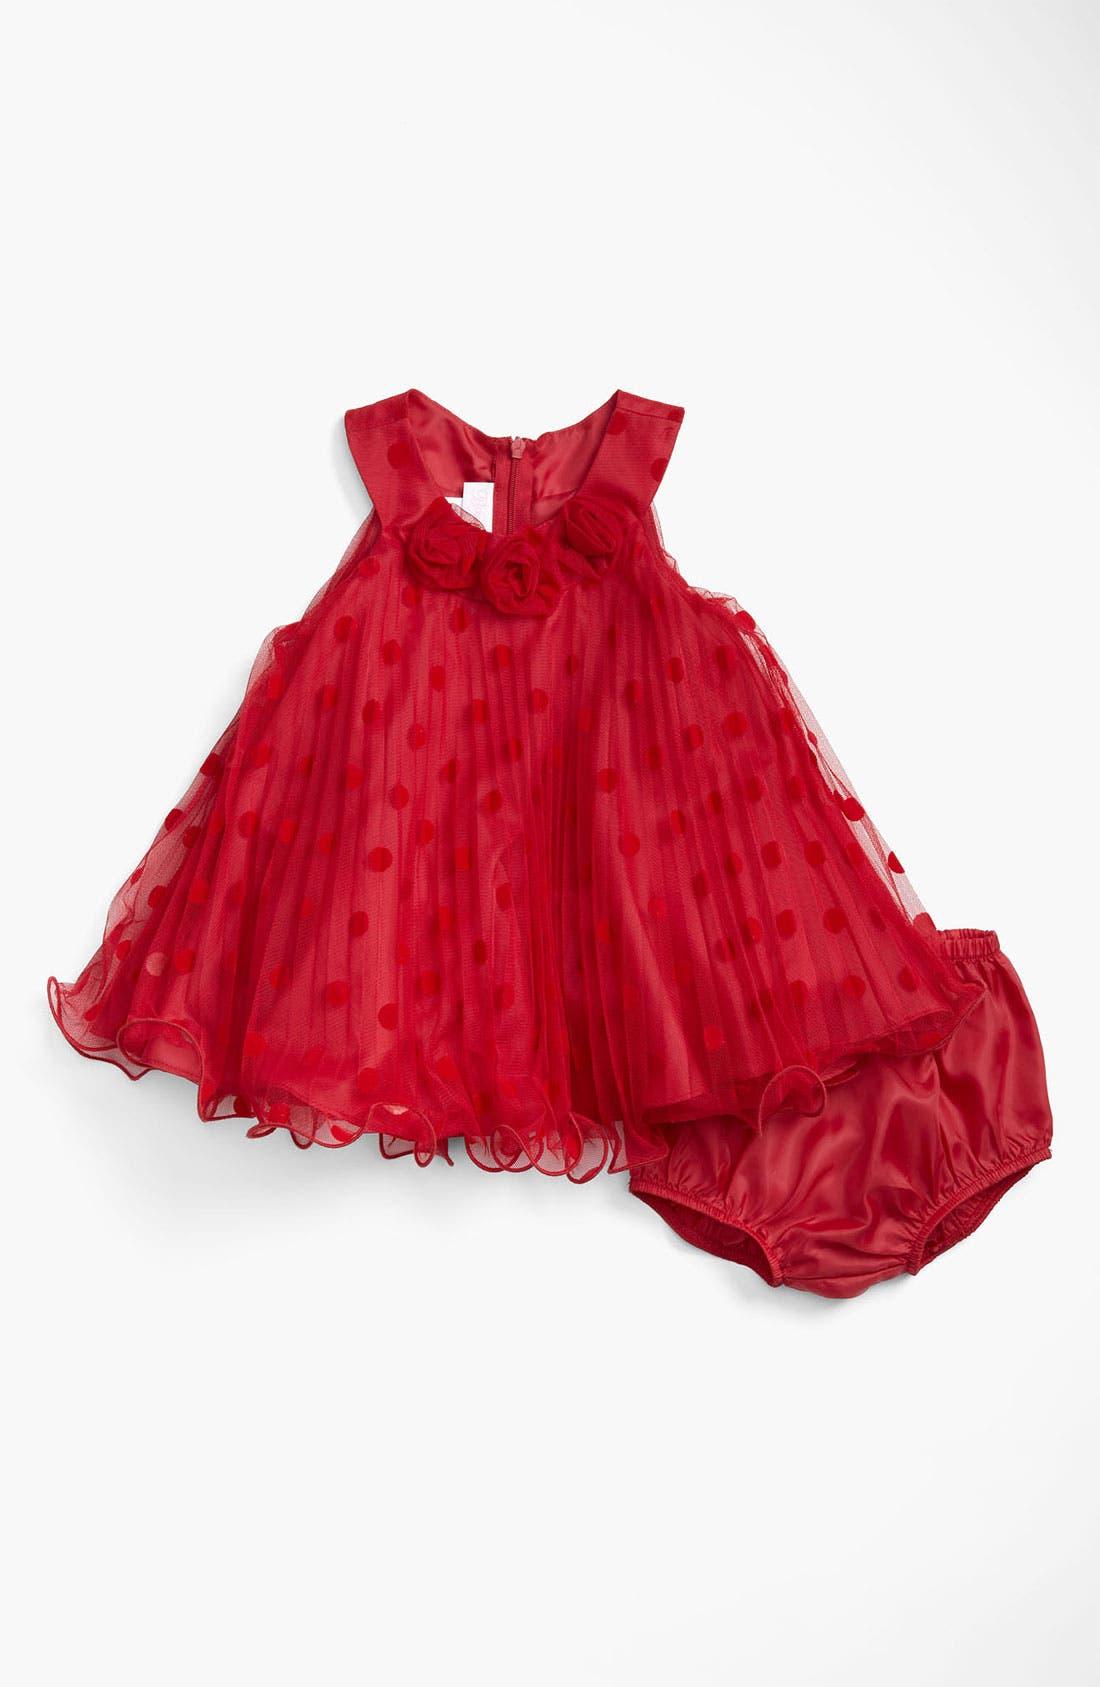 Main Image - Gerson & Gerson Polka Dot Mesh Dress (Infant)